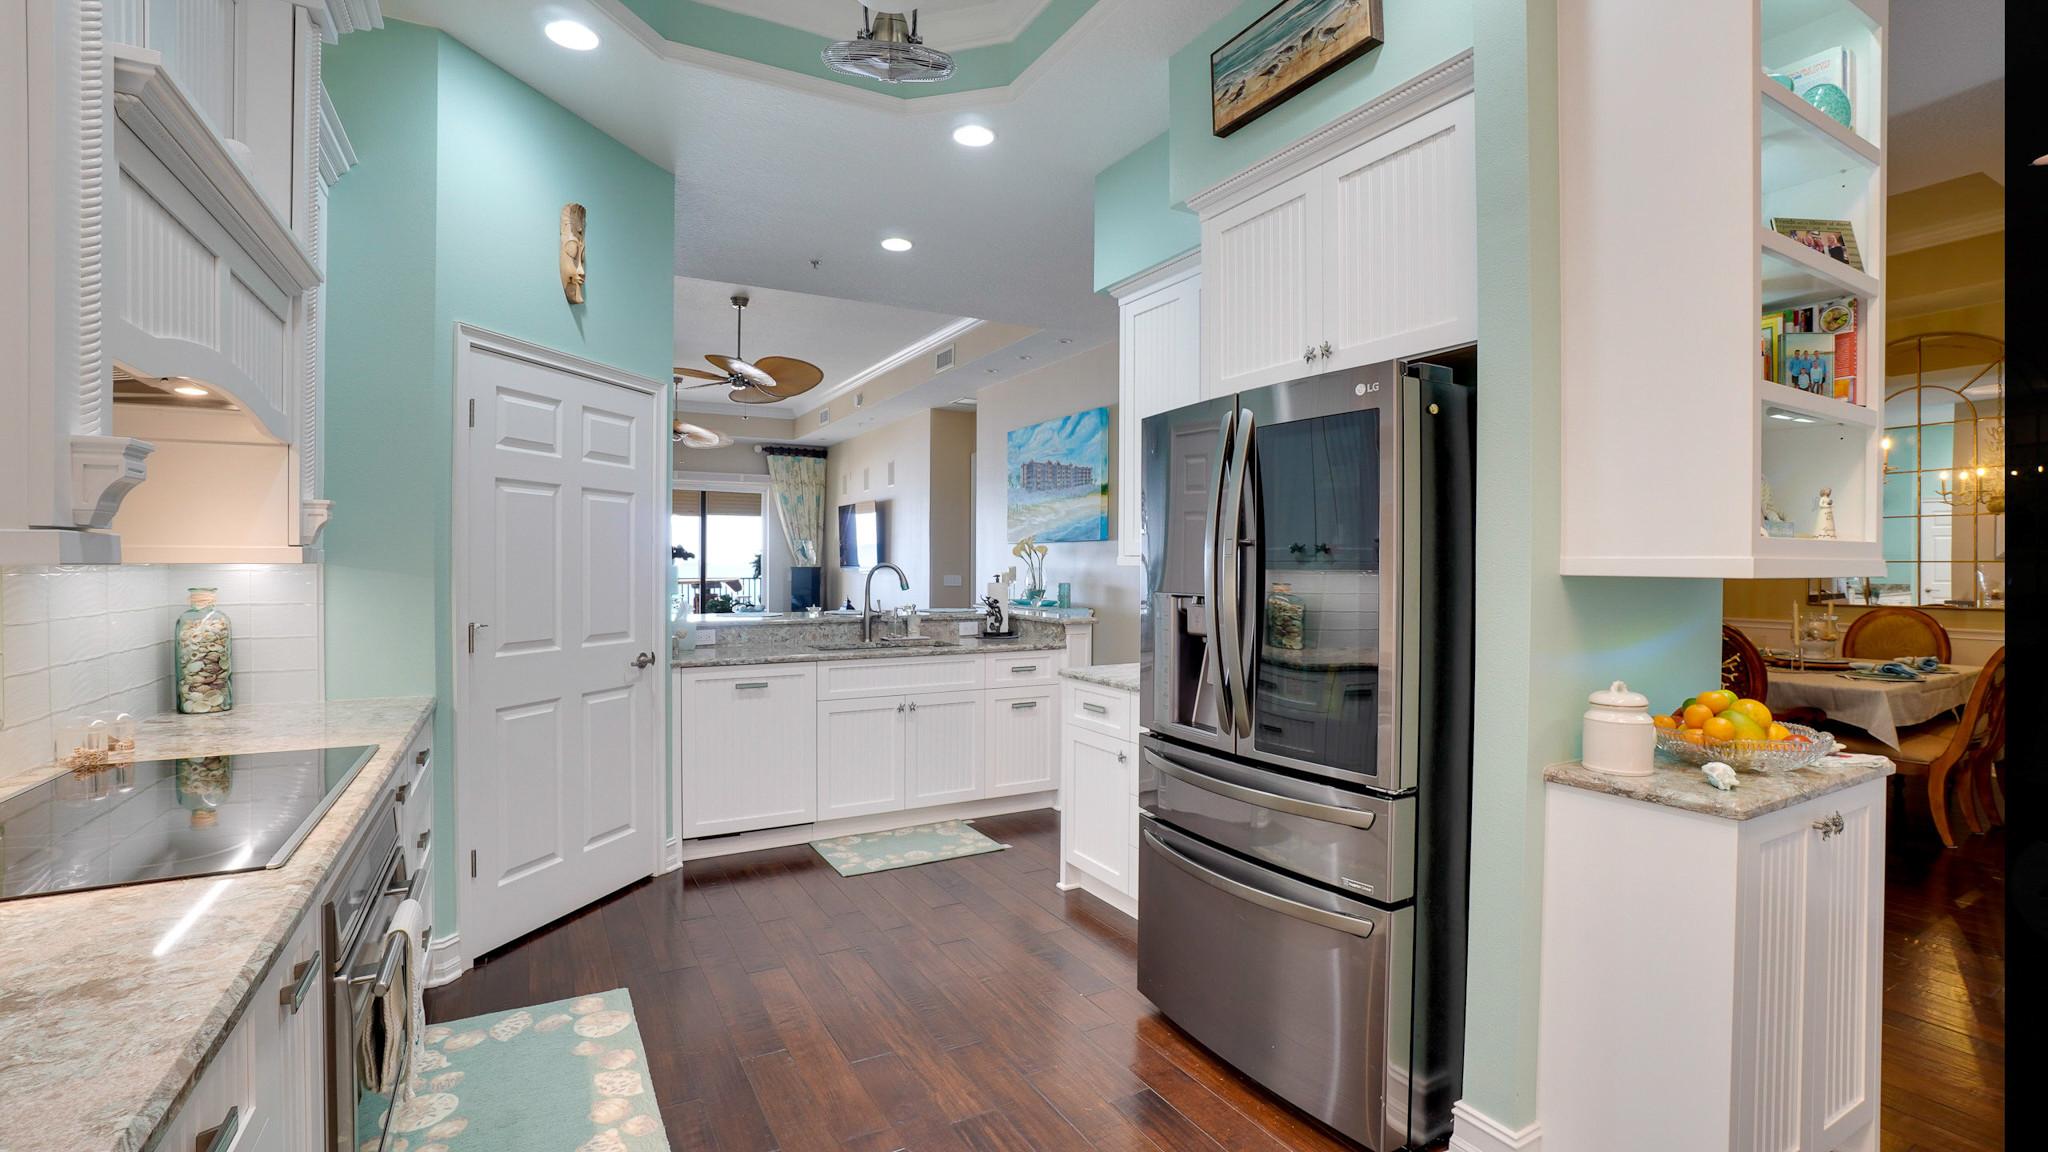 Oceanfront Condo Kitchen